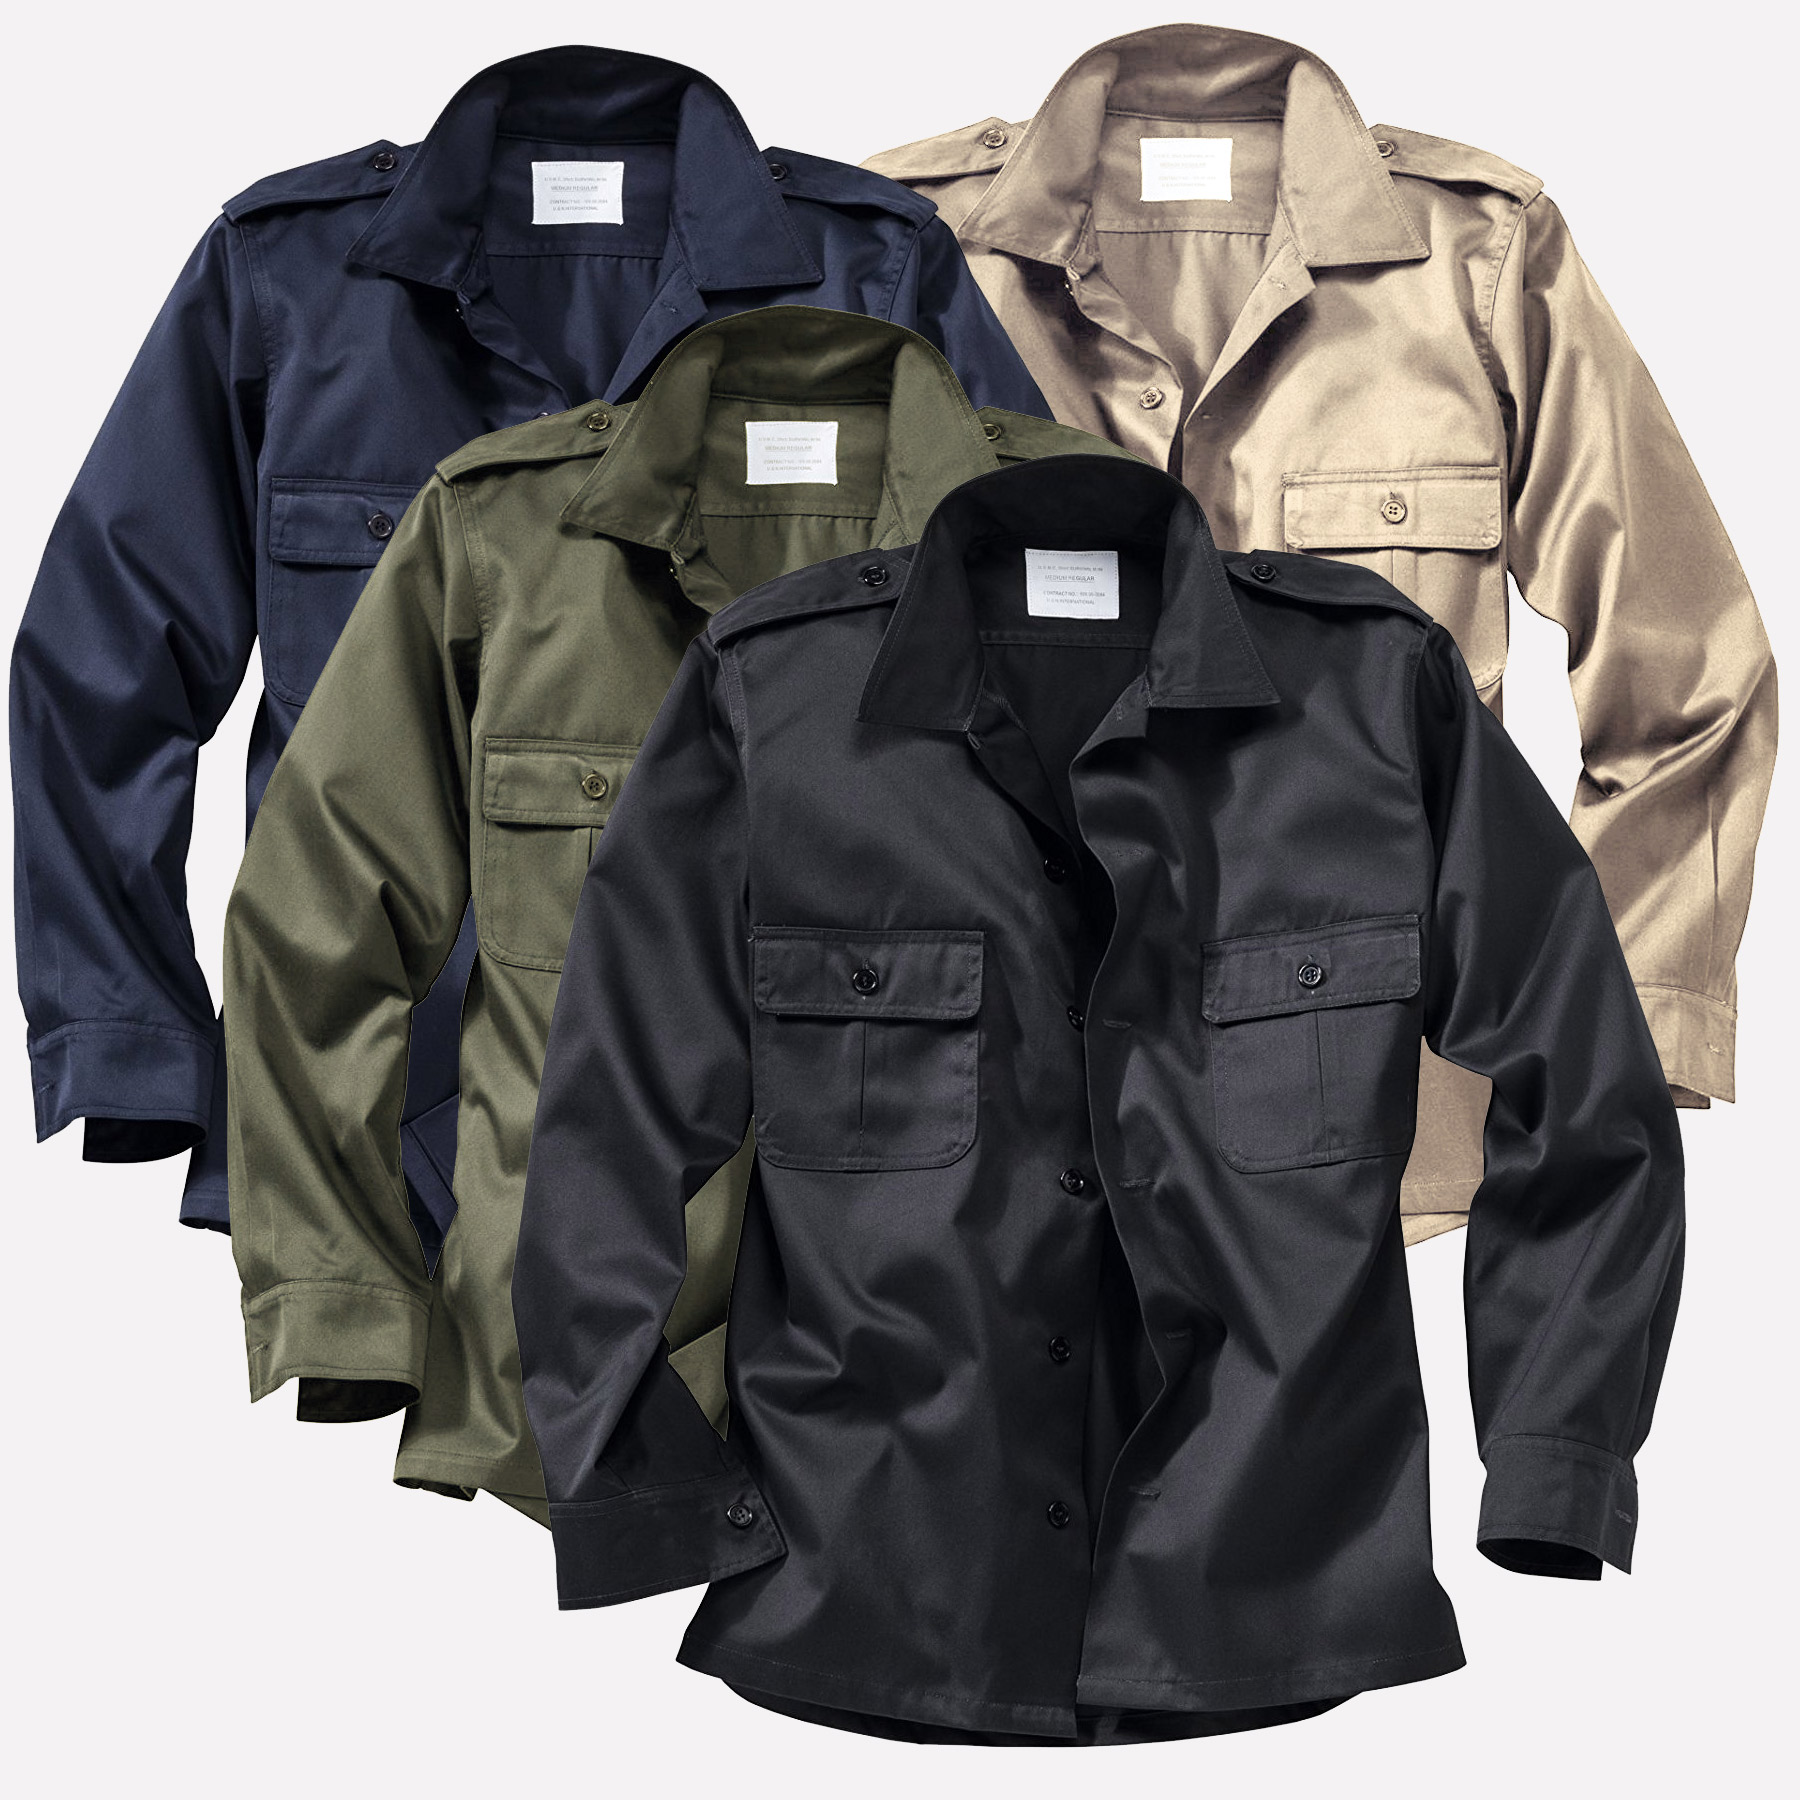 Details about Surplus Raw Vintage m65 US Ranger Army Military Shirt Security Worker Shirt 11arm show original title